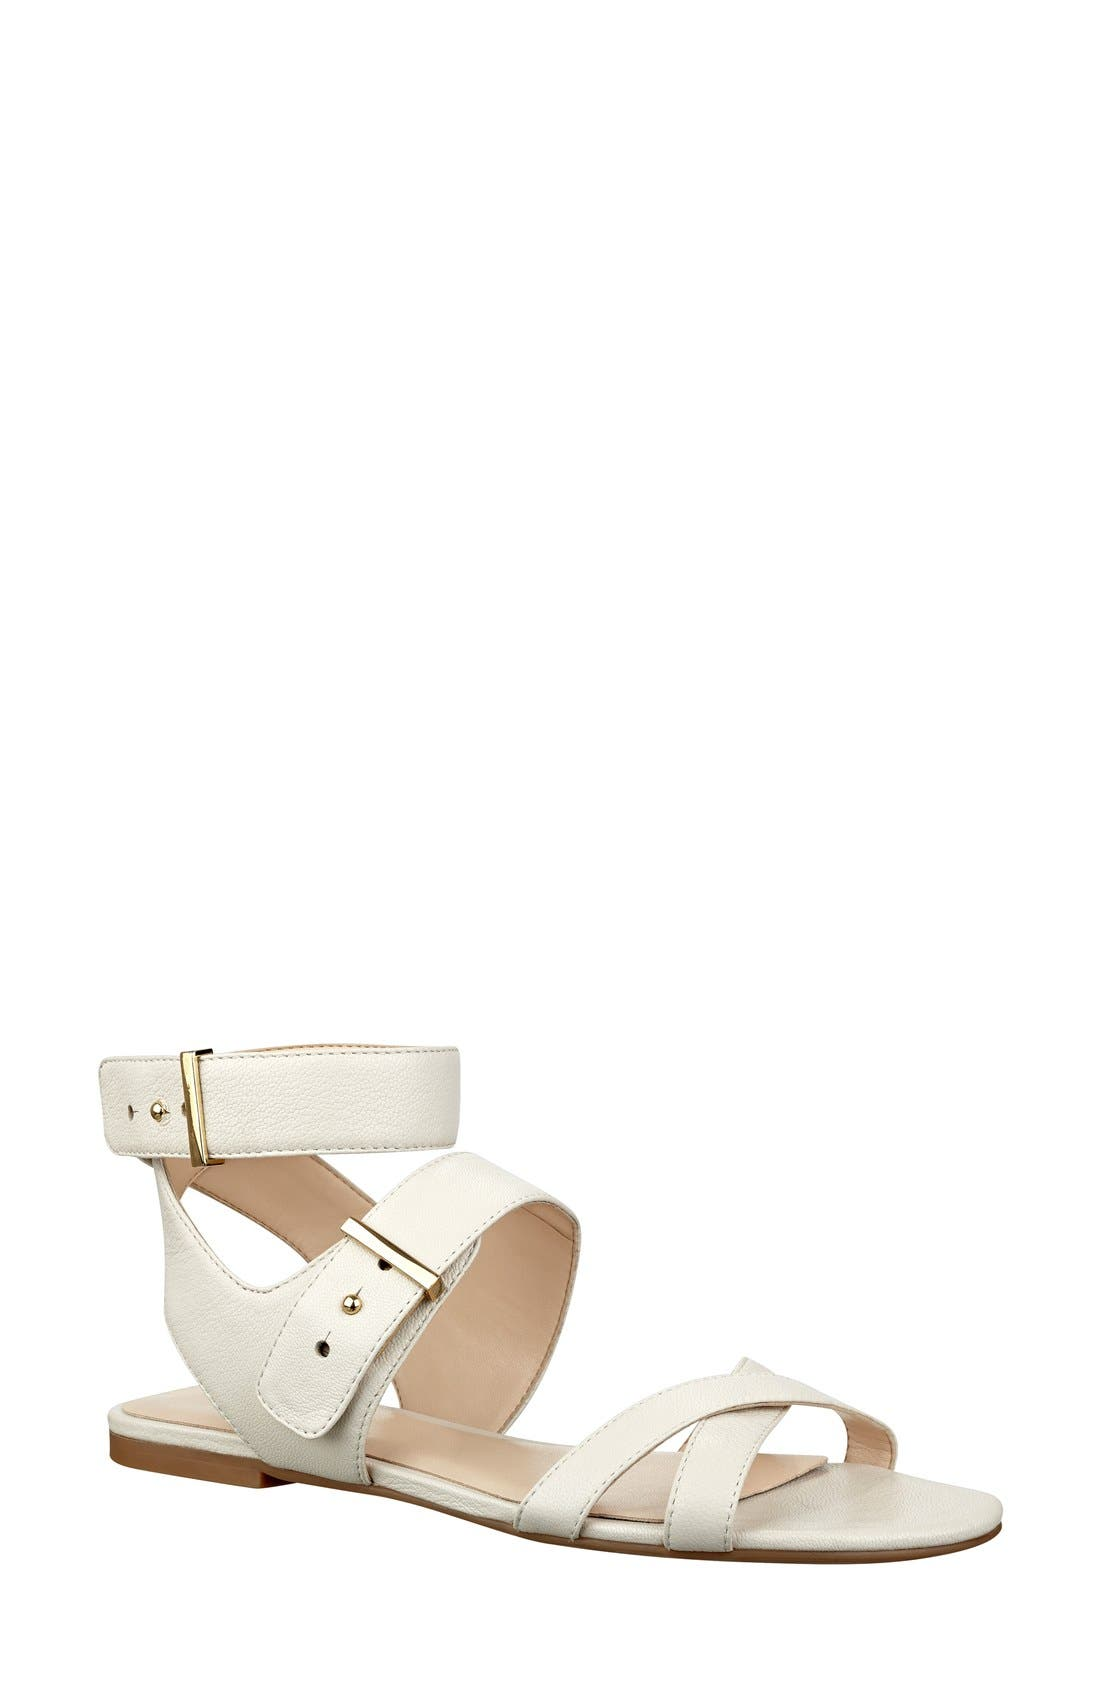 Alternate Image 1 Selected - Nine West 'Darcelle' Flat Sandal (Women)